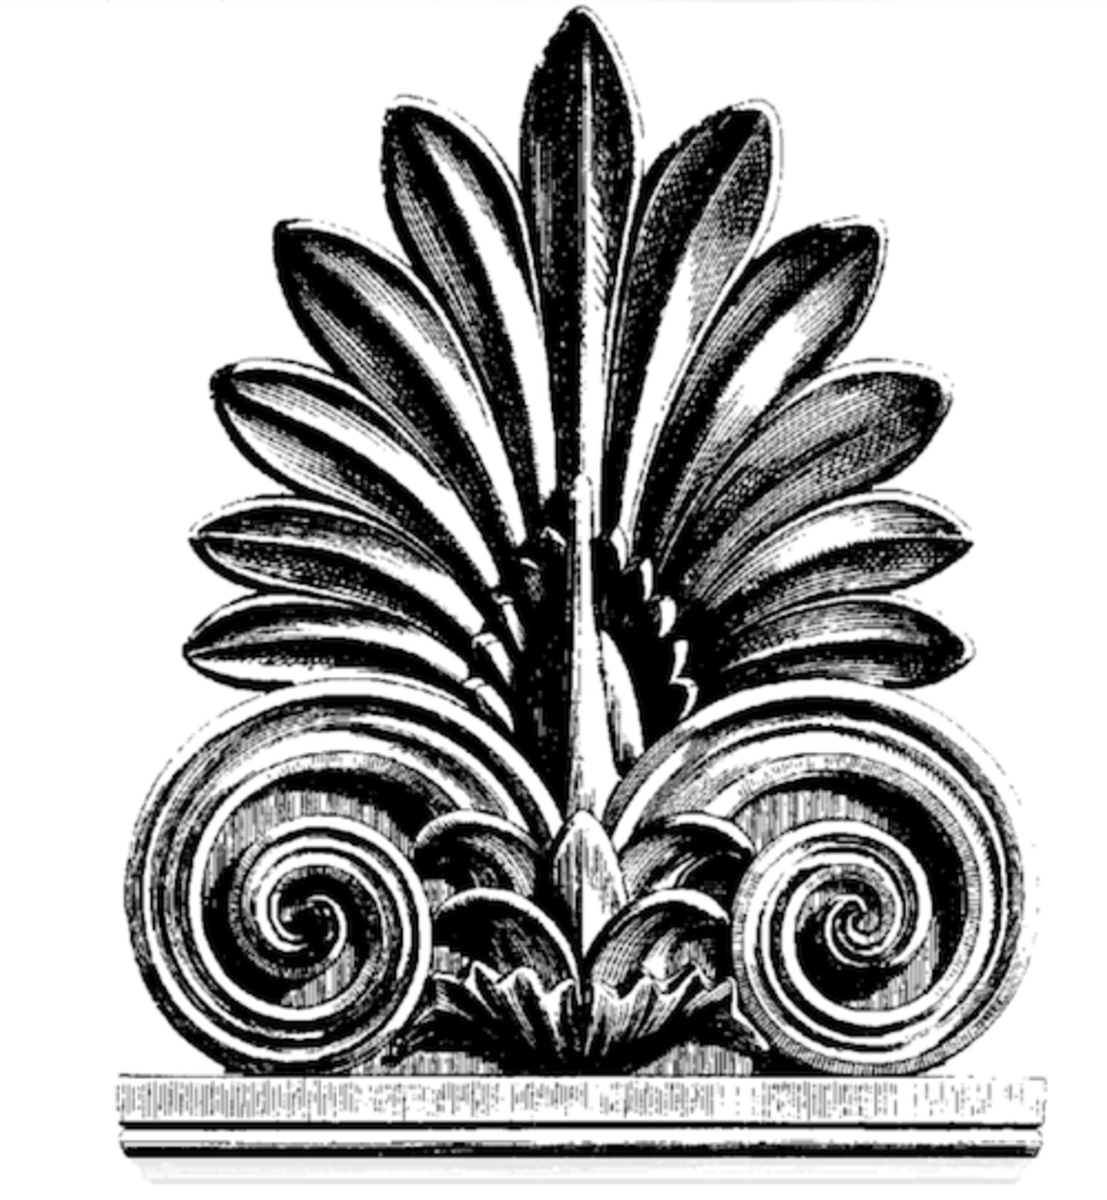 Palladio Award, Traditional Building